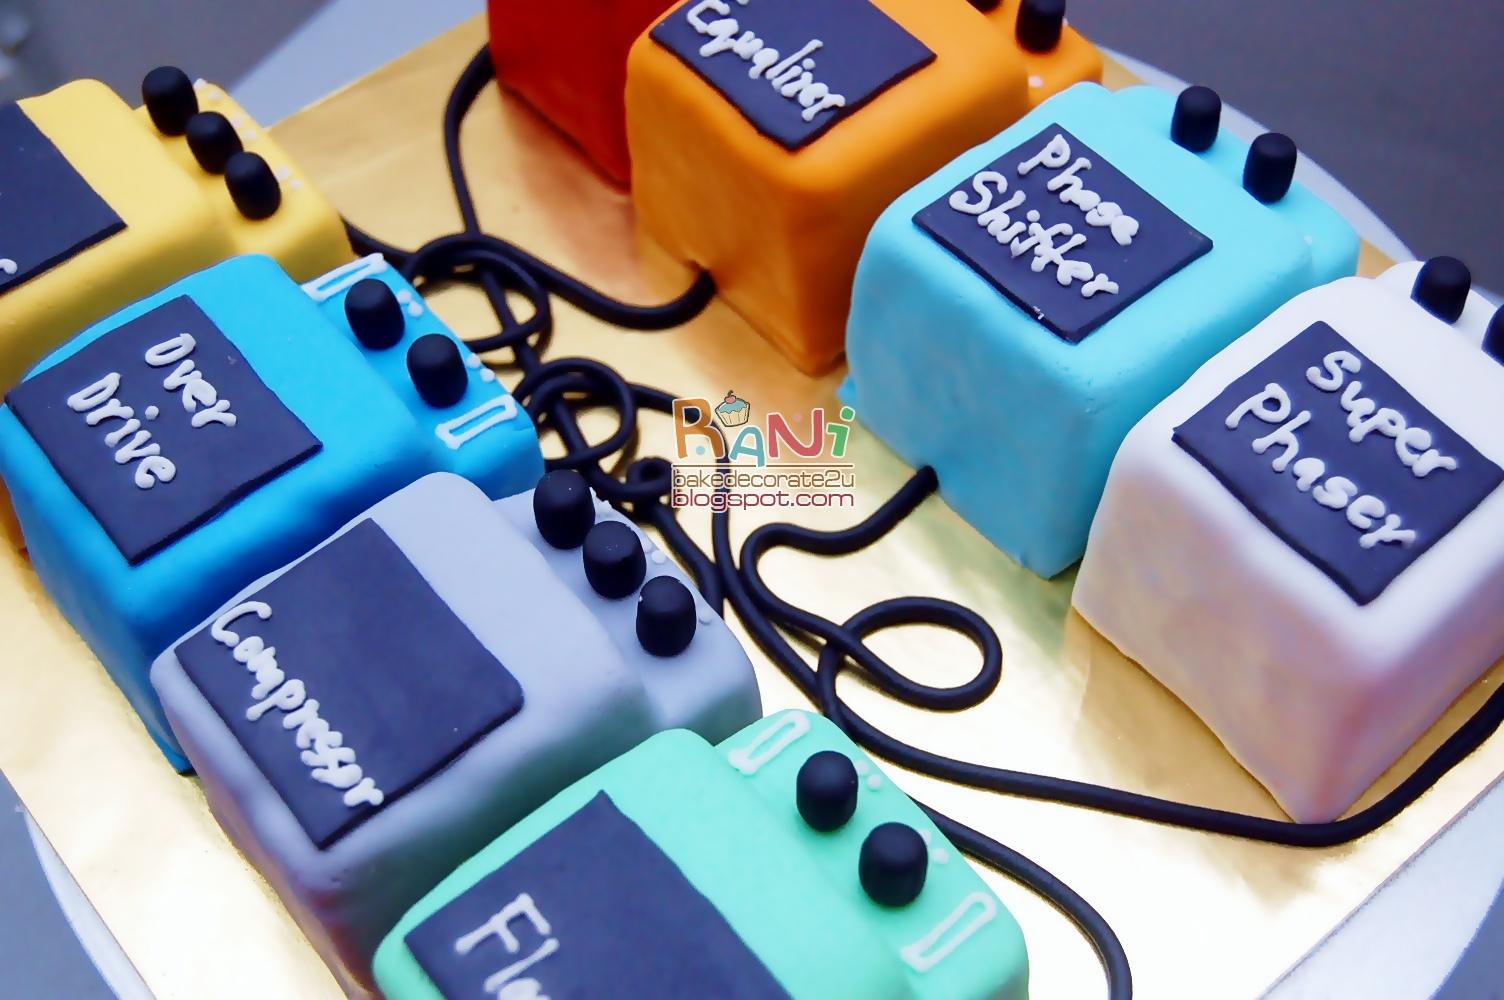 Cake Images With Name Rani : Rani Canglun Delights: .:.fondant hantaran cake.:.